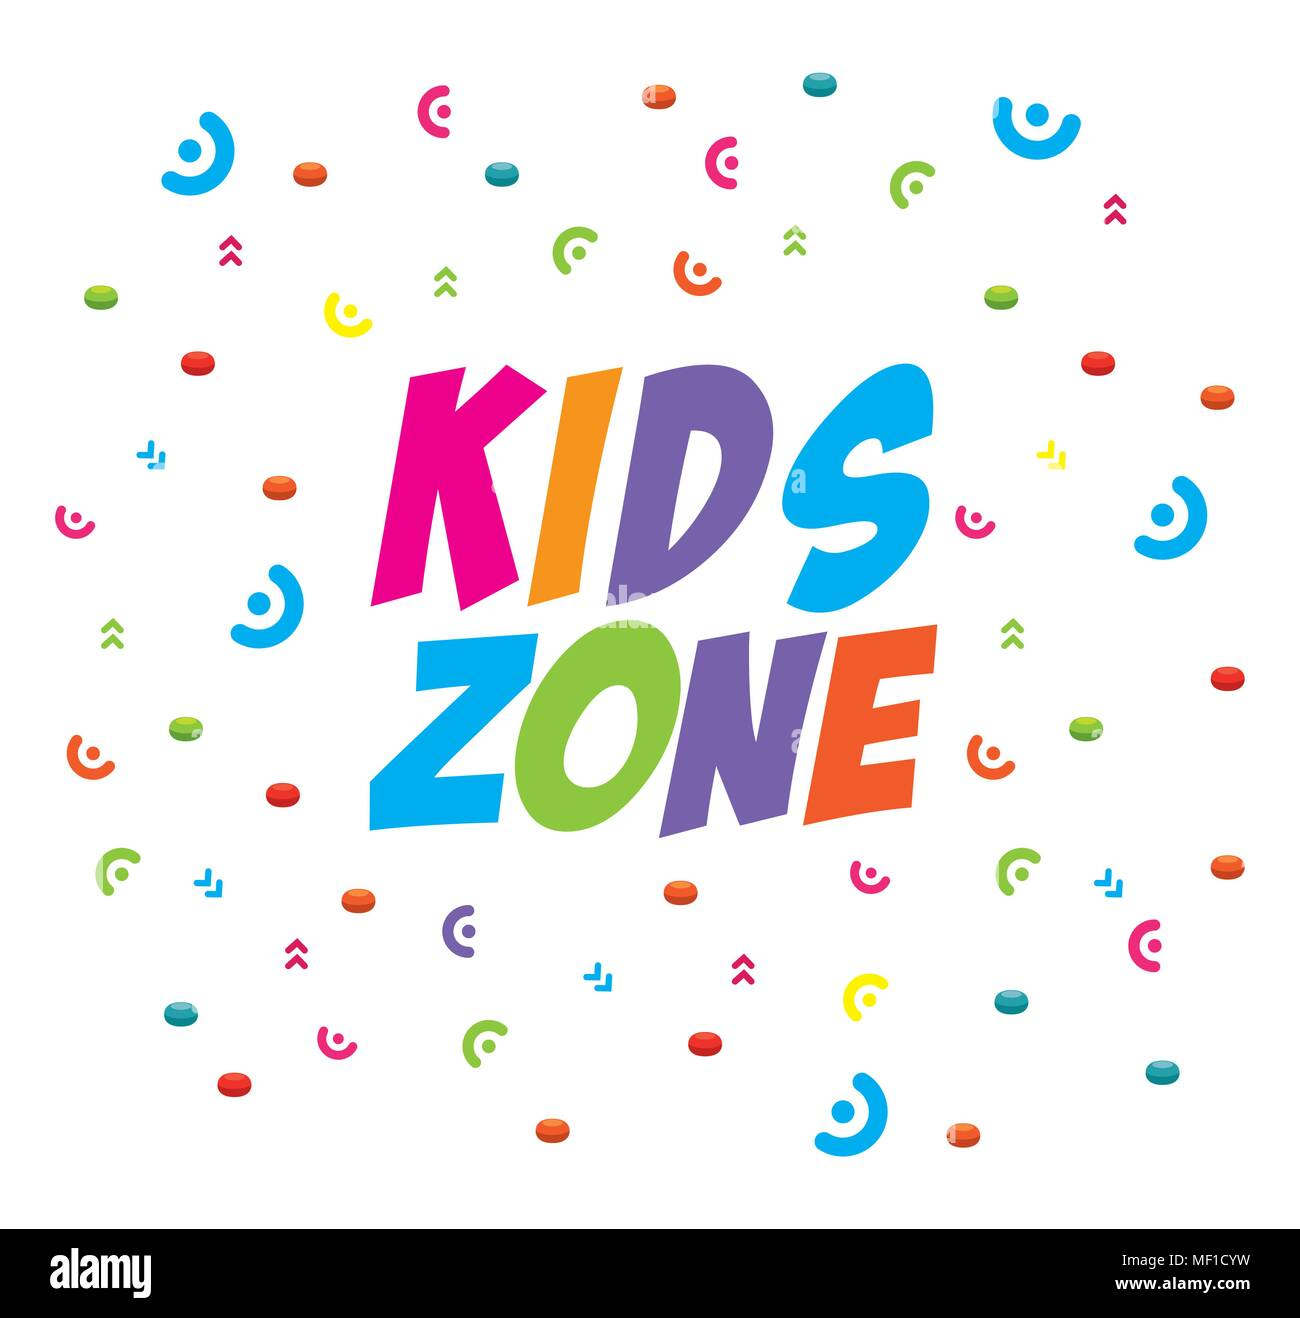 Kidzone Stock Photos & Kidzone Stock Images - Alamy